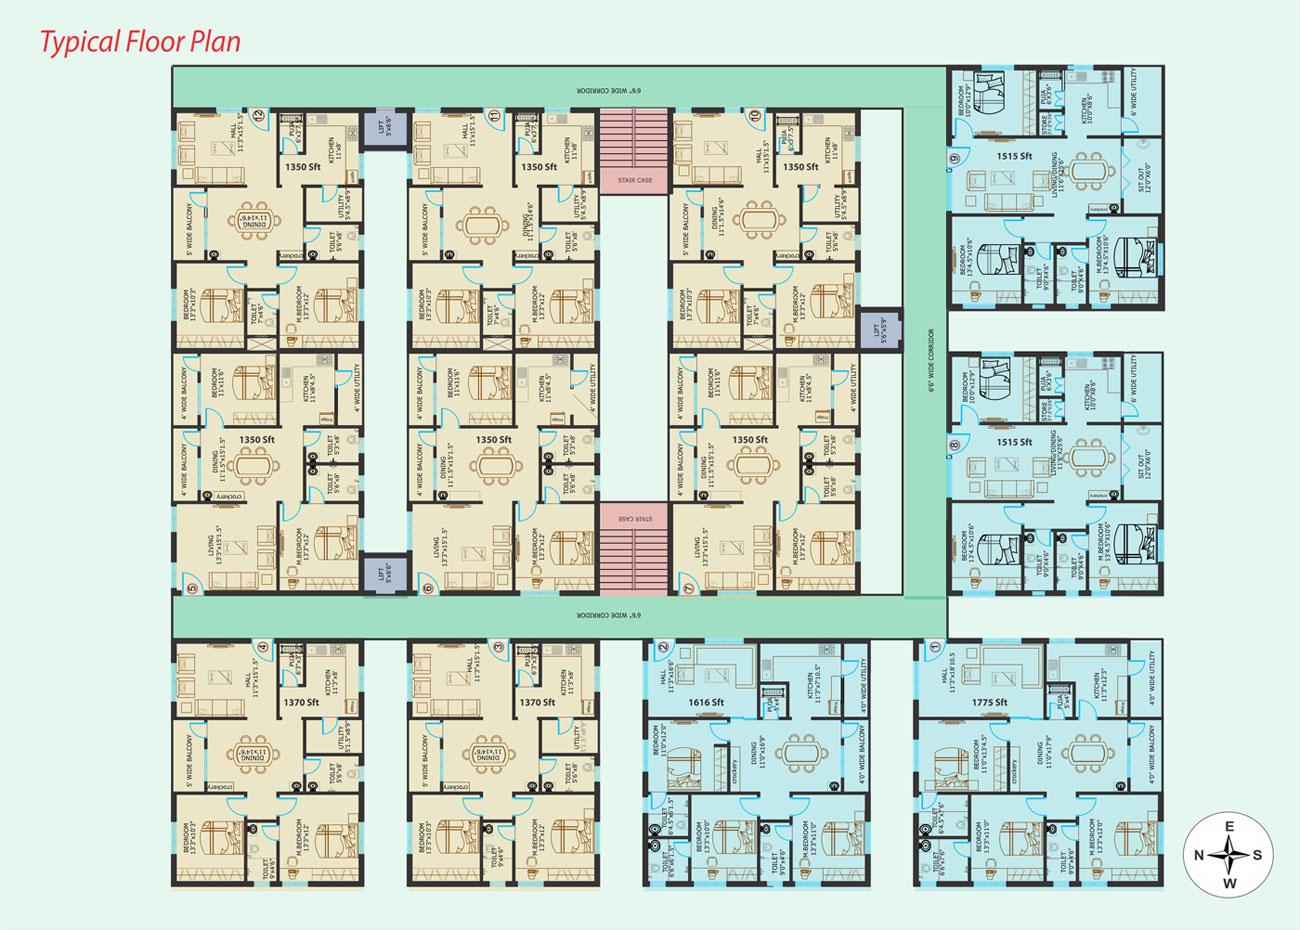 typical-floor-plan-web